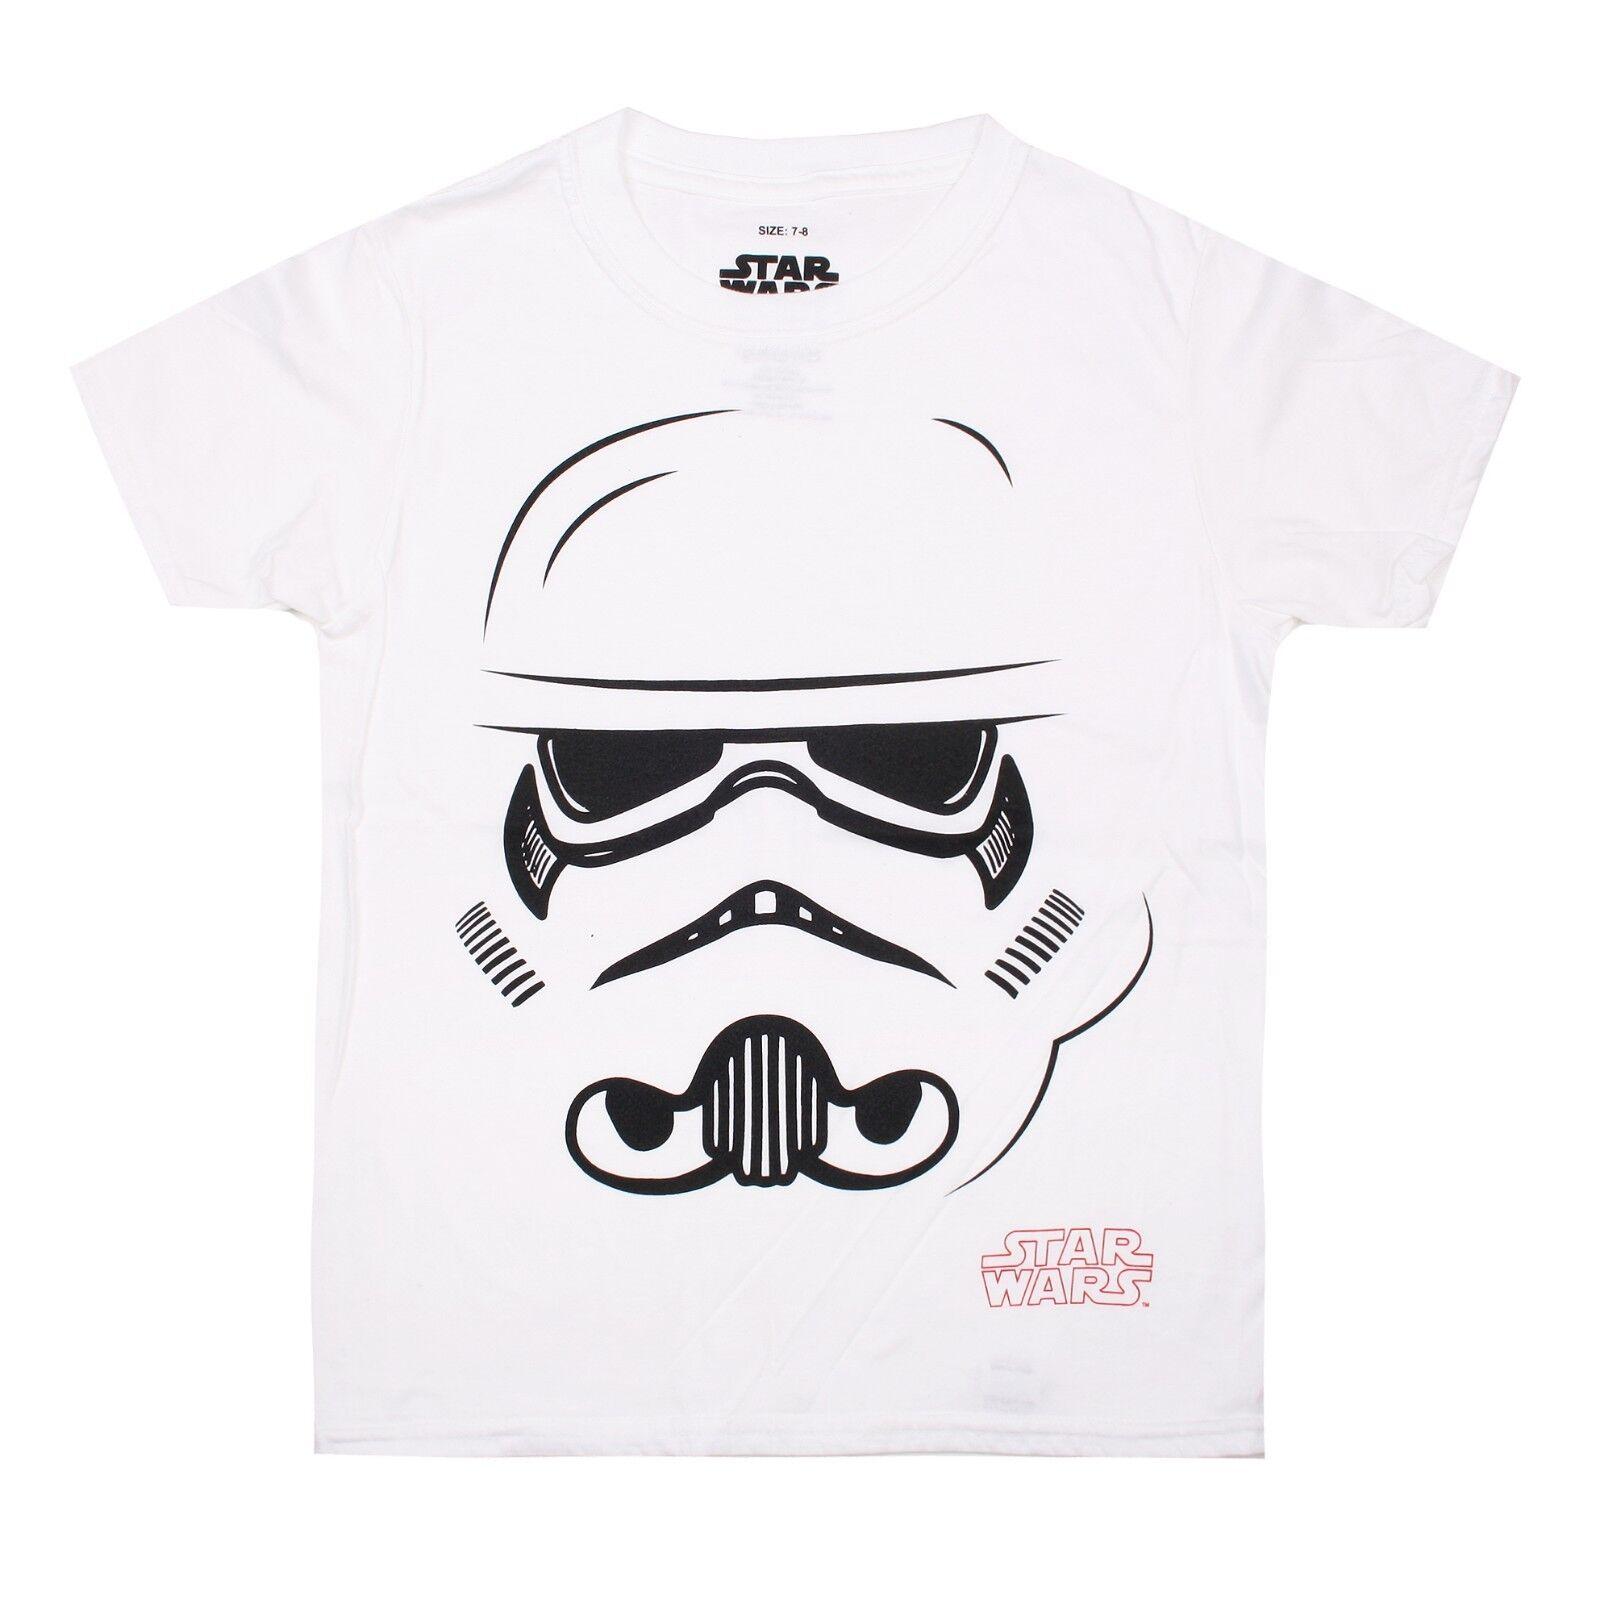 AGE 5-6 Star Wars Kids Boys Girls T-Shirt Storm Trooper Face Helmet White